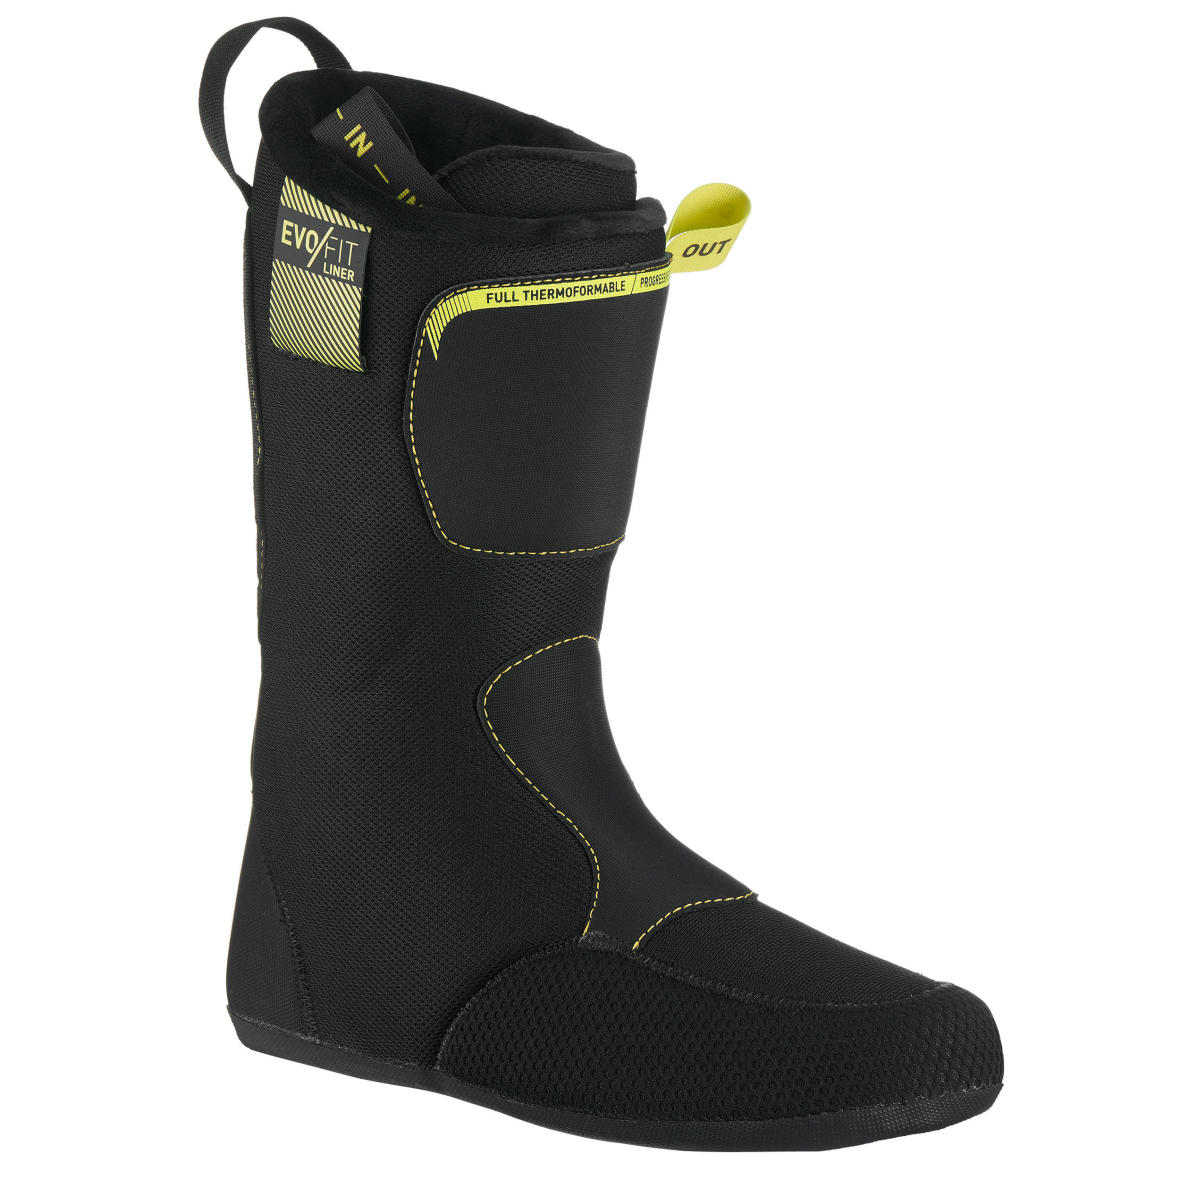 chausson chaussure de ski